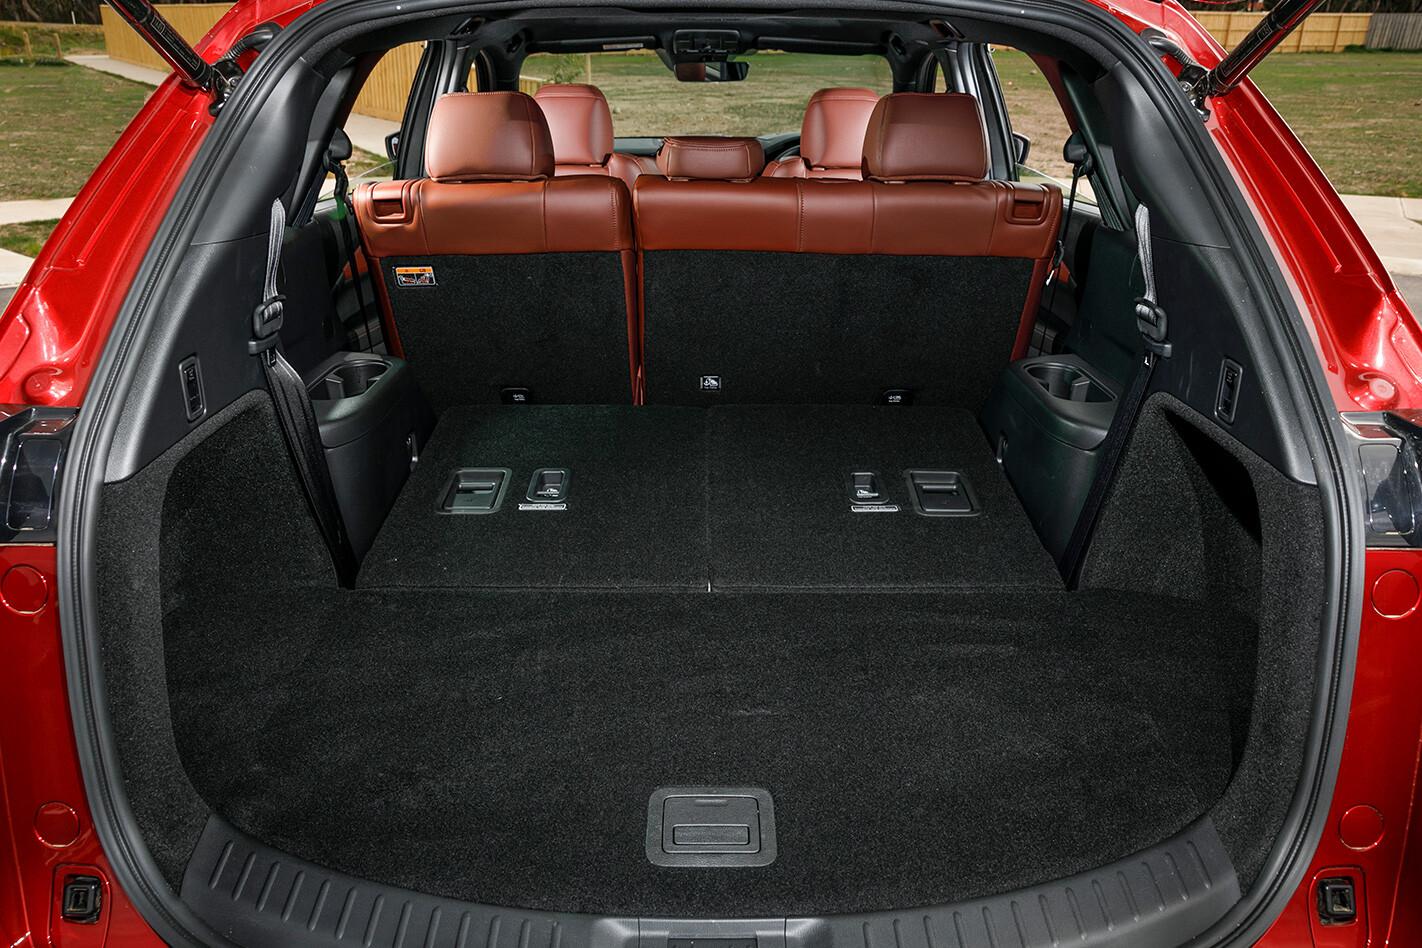 Mazda Cx 9 Boot Jpg